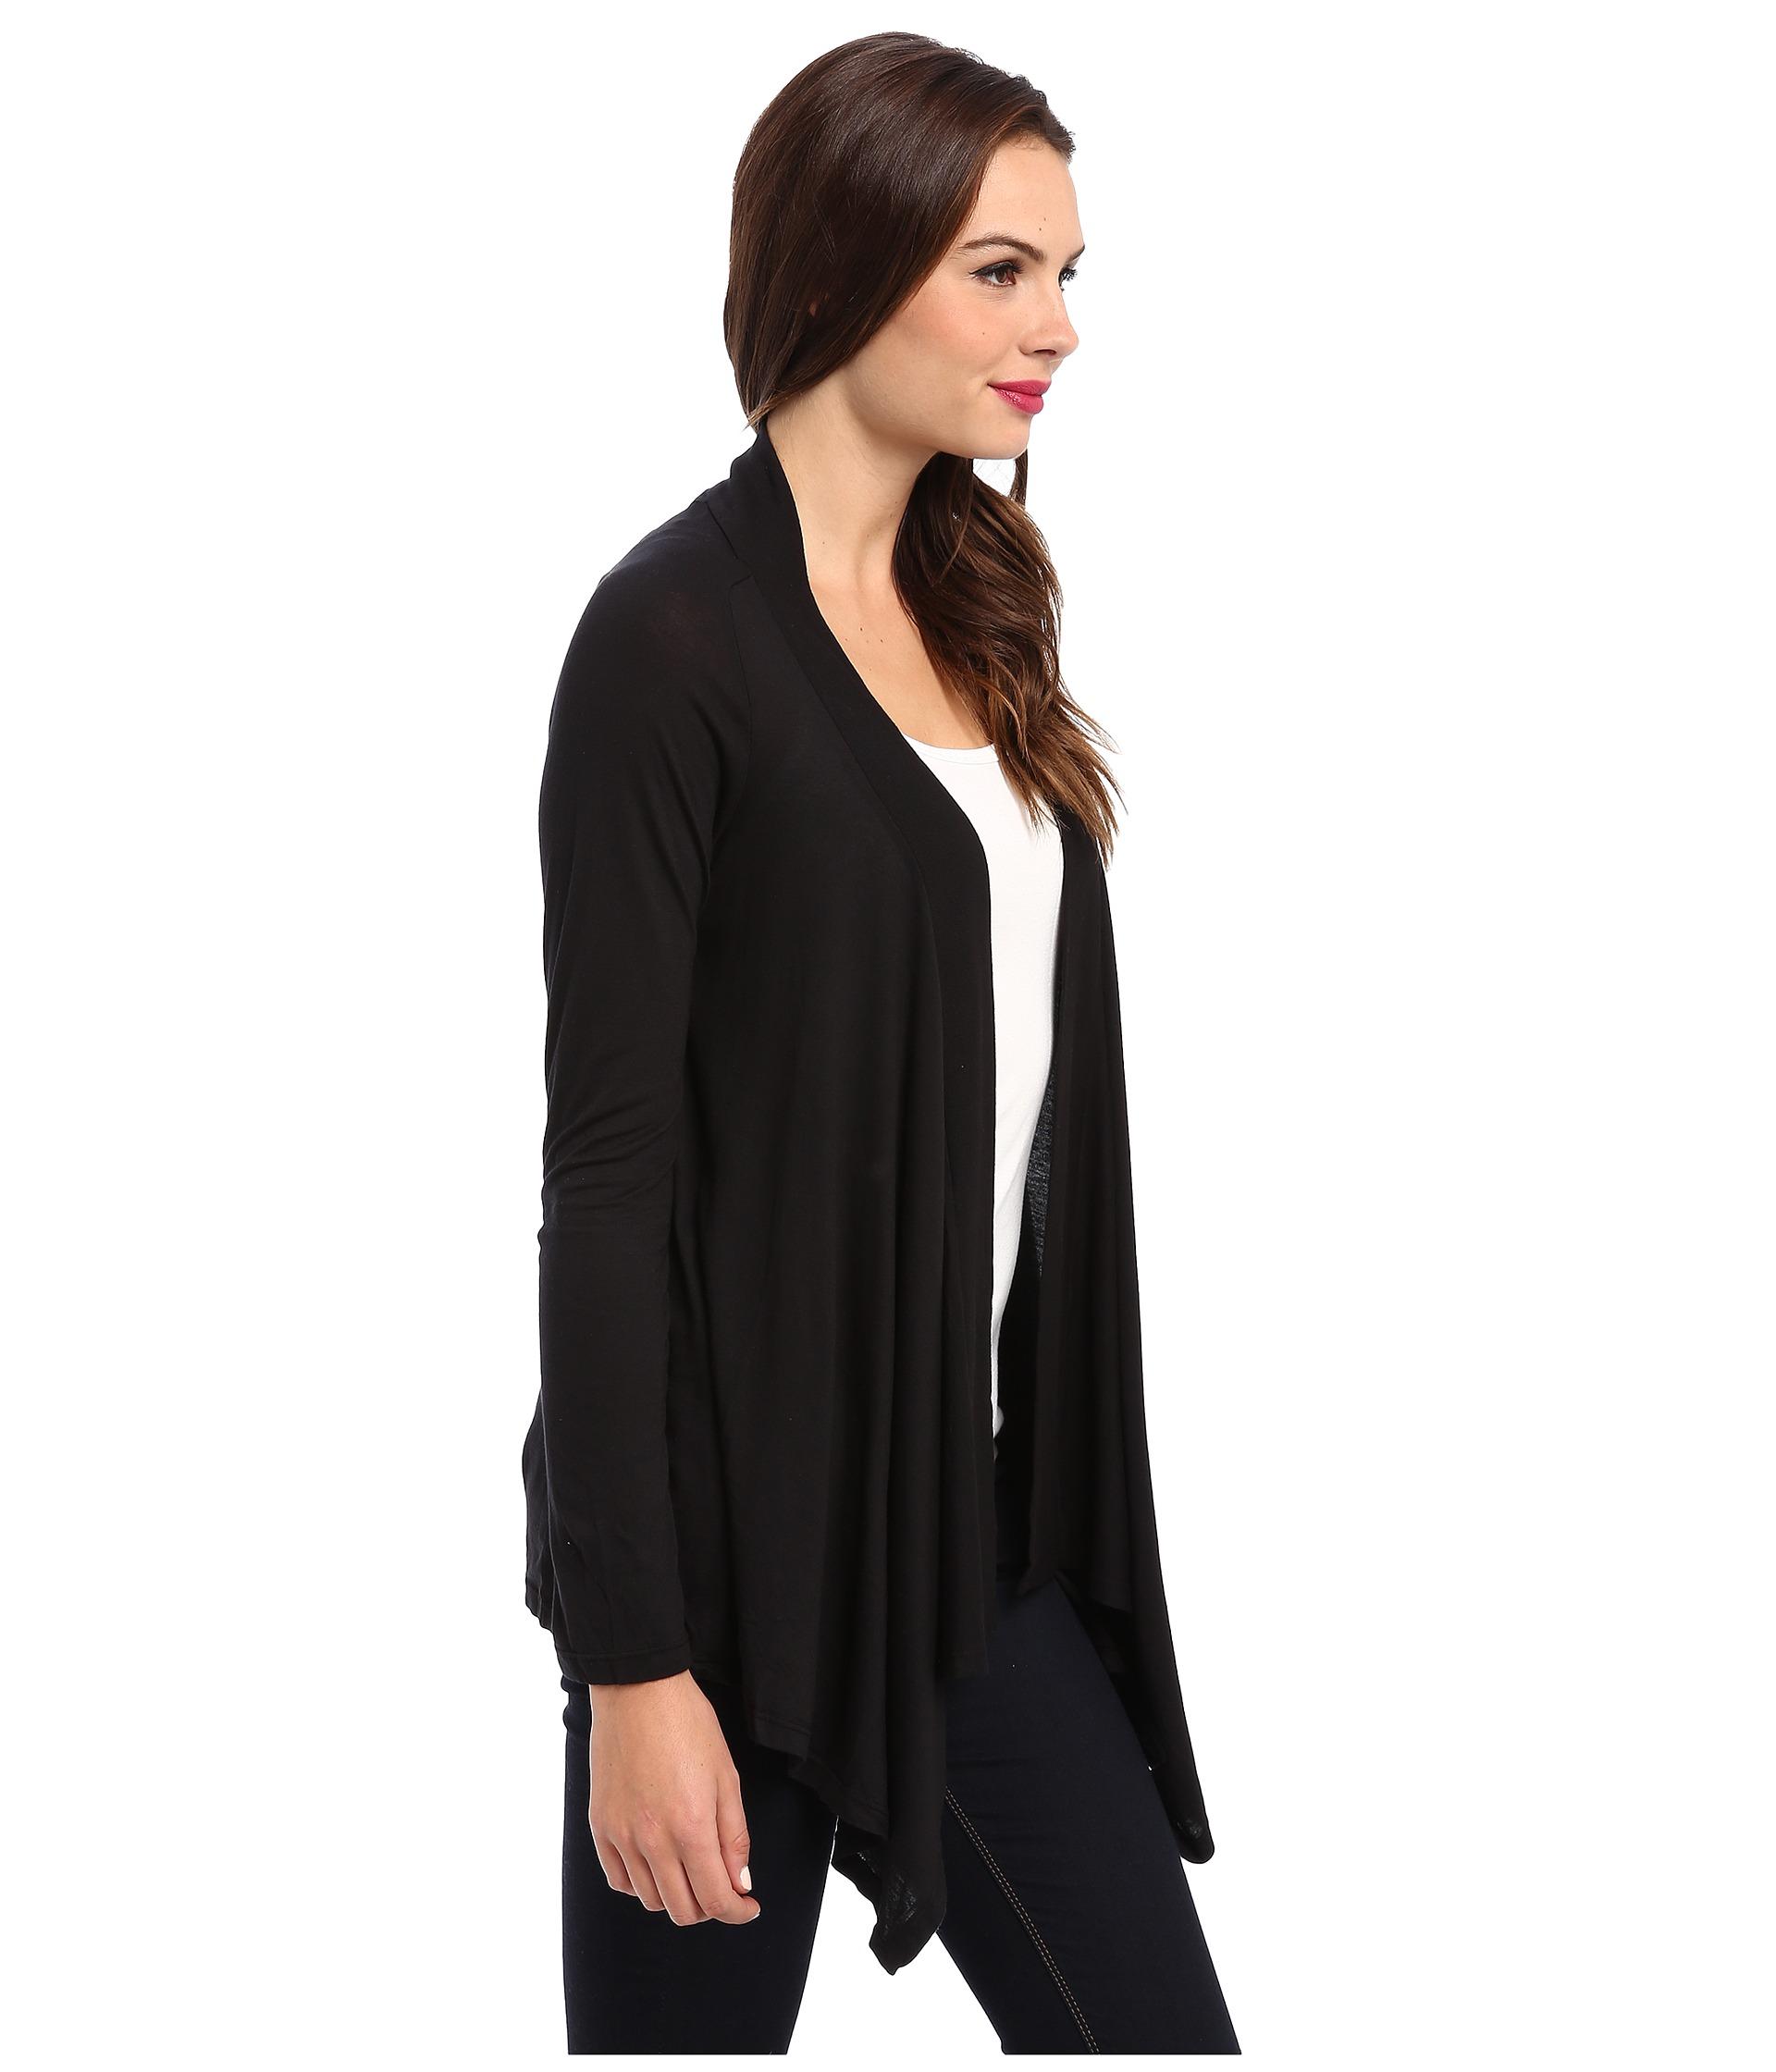 Splendid Very Light Jersey Drape Cardigan At Zappos.com